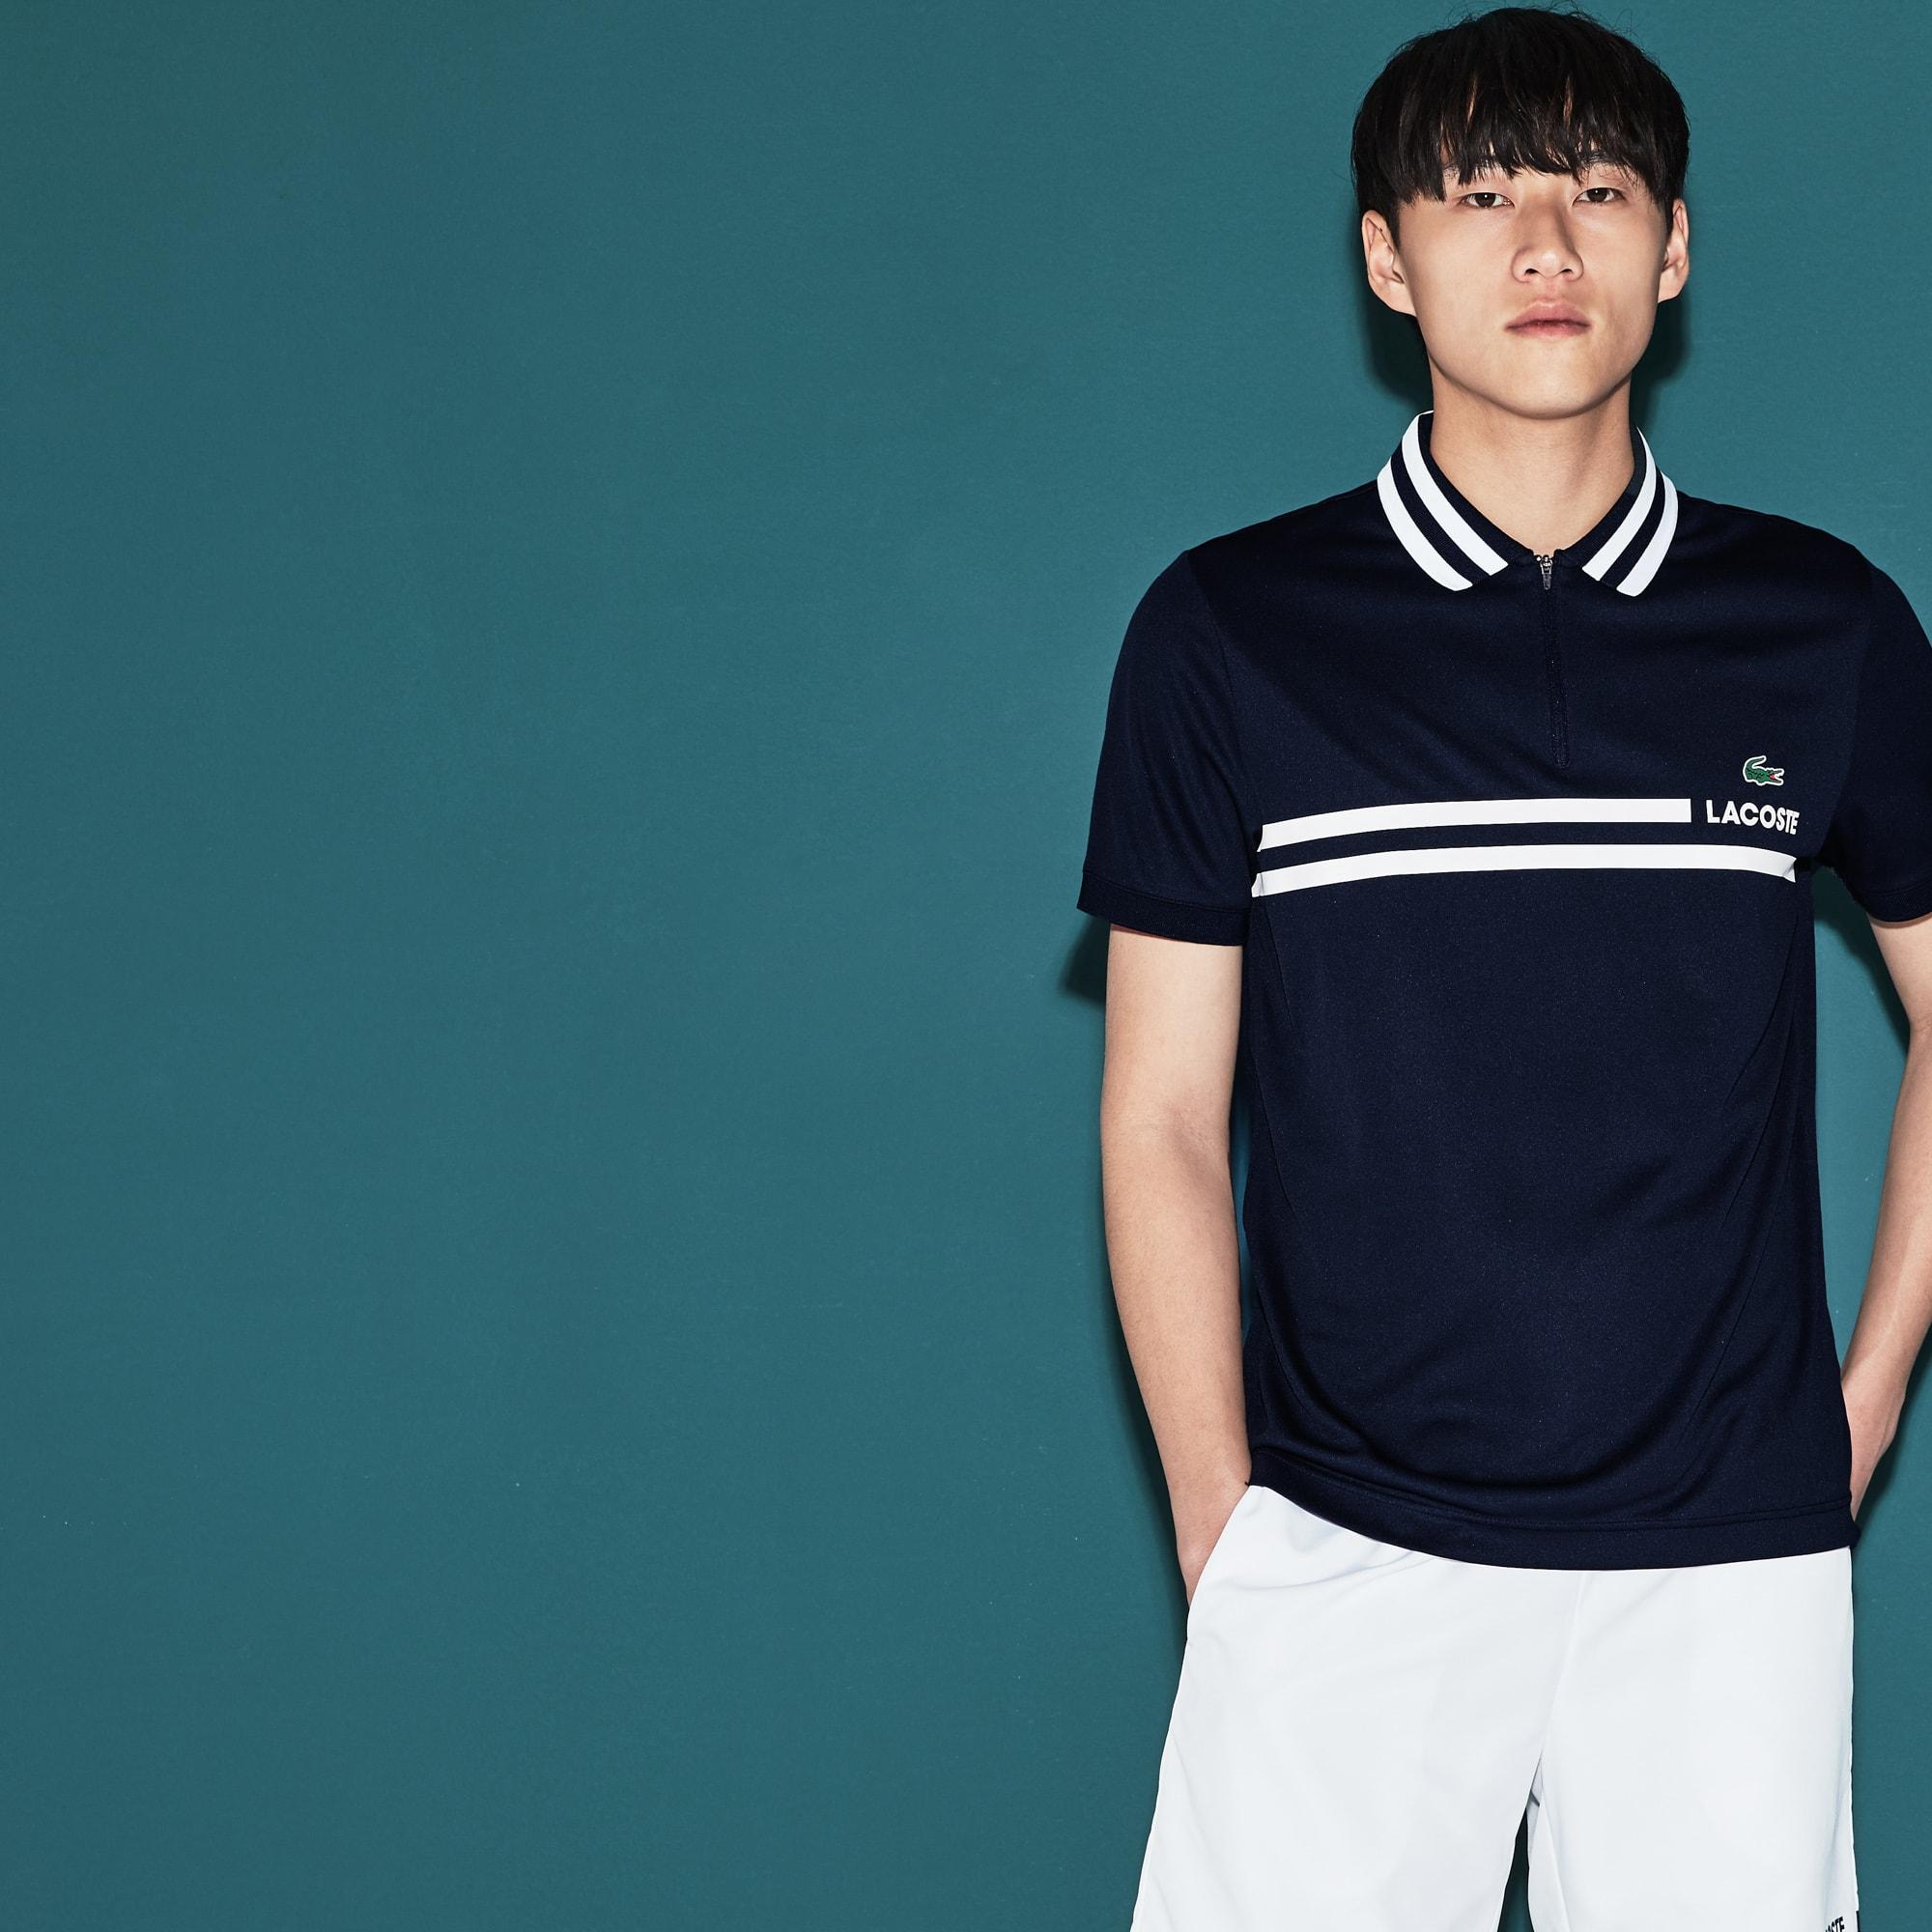 Men's Lacoste SPORT Contrast Band Tech Piqué Tennis Polo Shirt